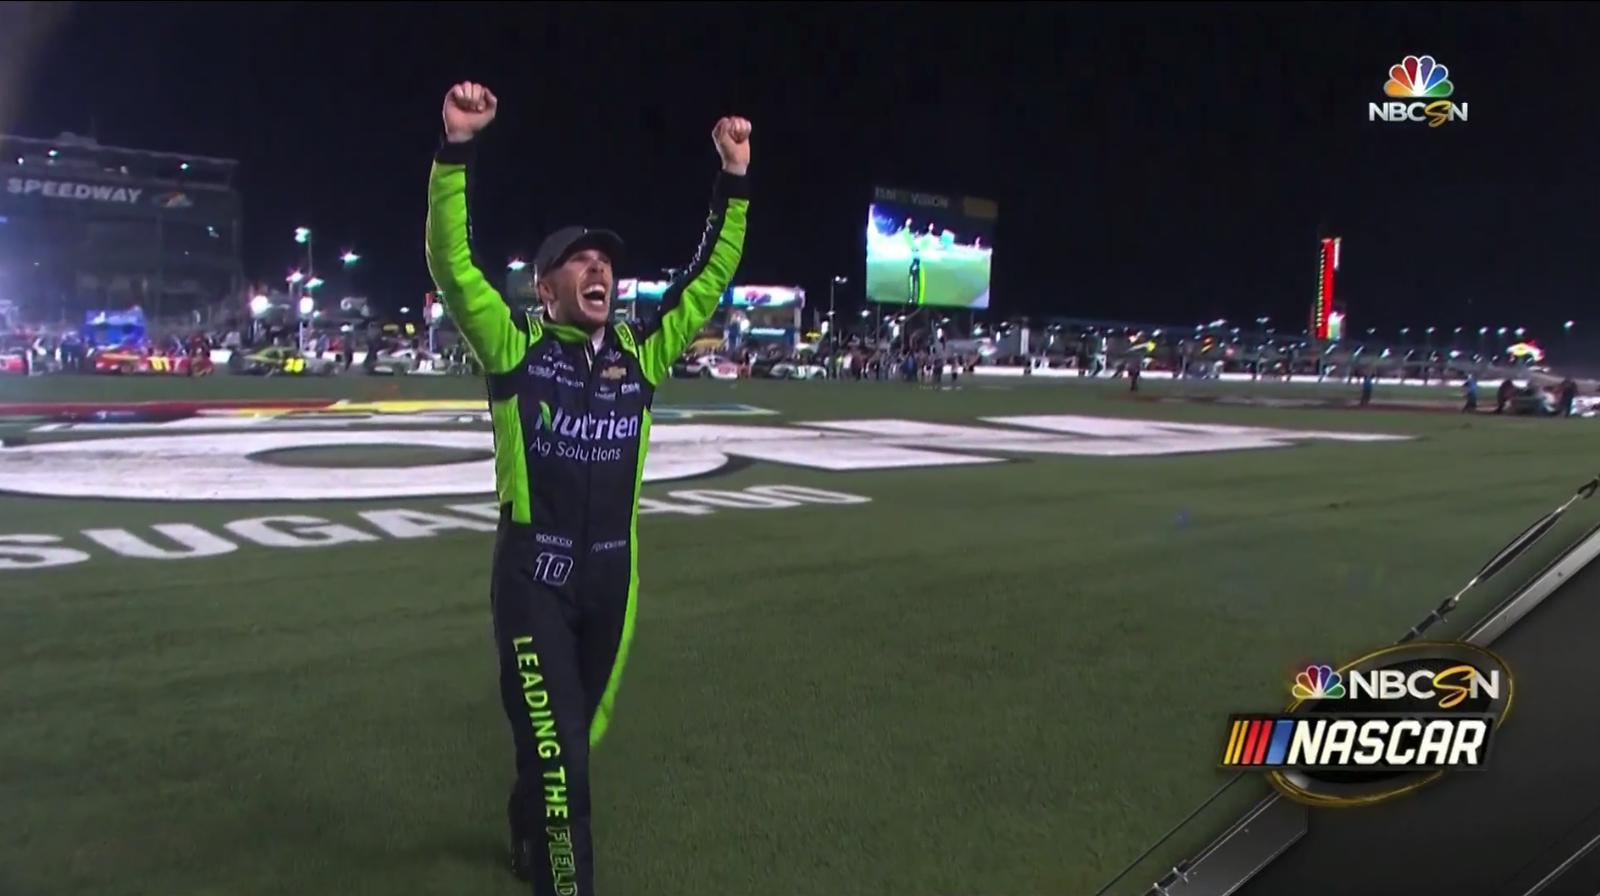 NCS_NBC-Sports_NASCAR-Design_0022